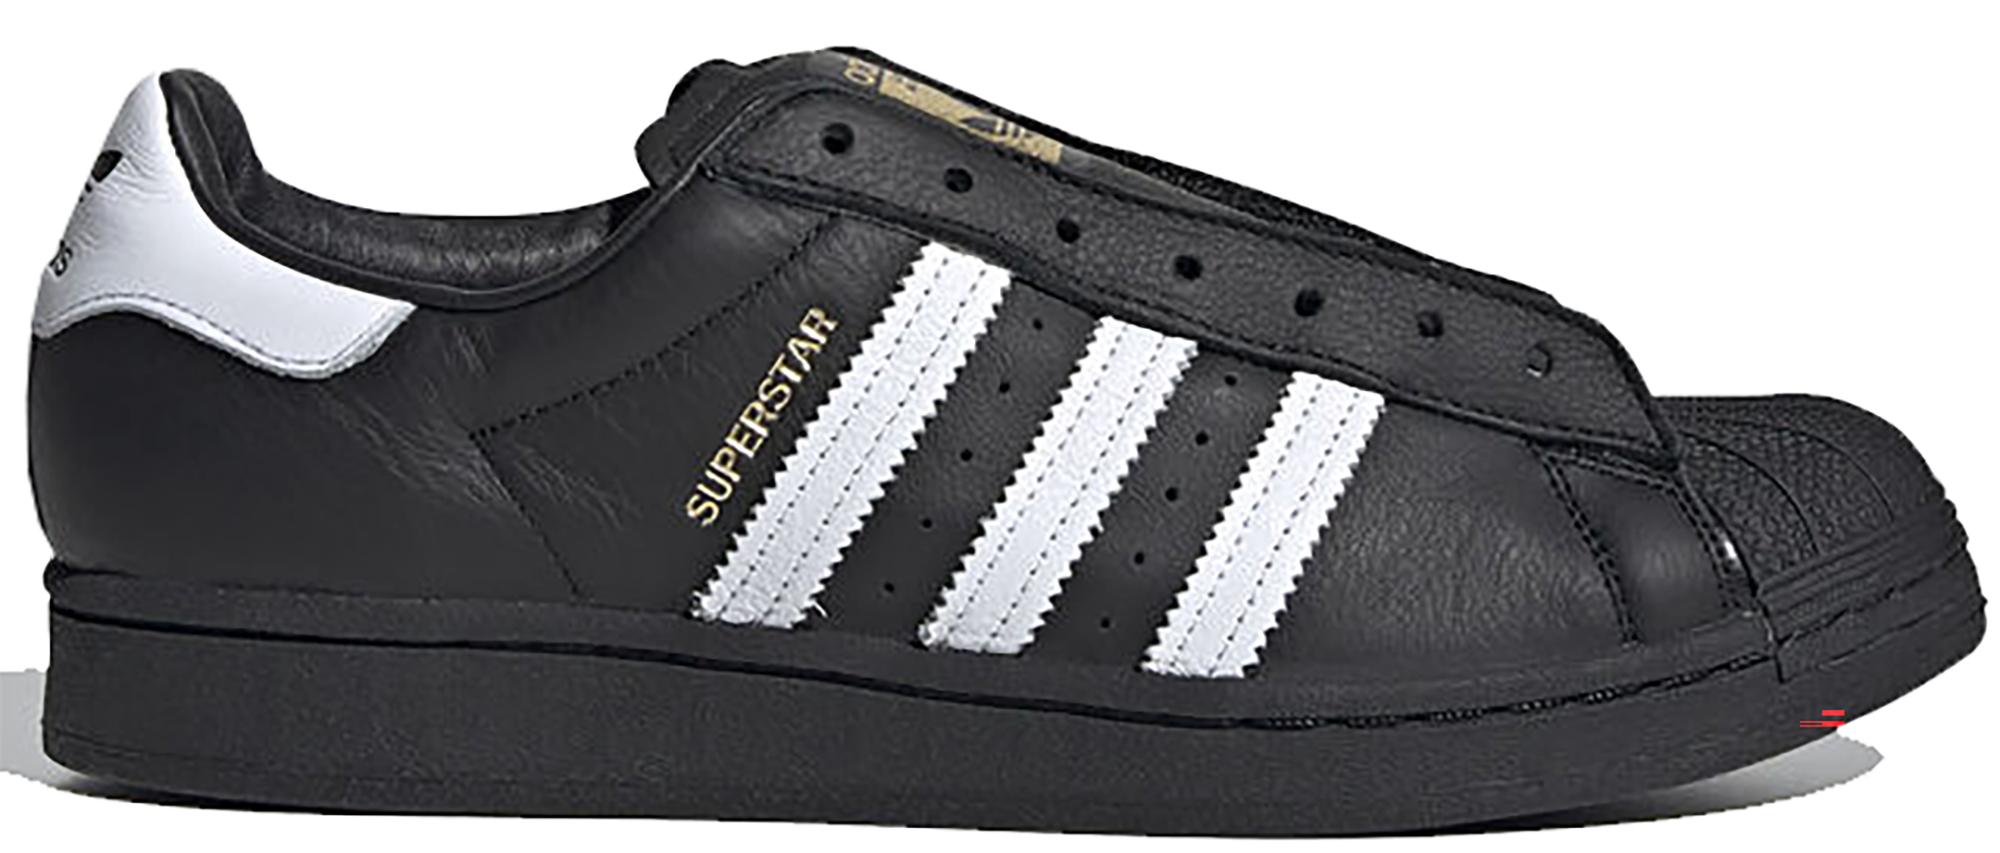 adidas superstar black white cheap